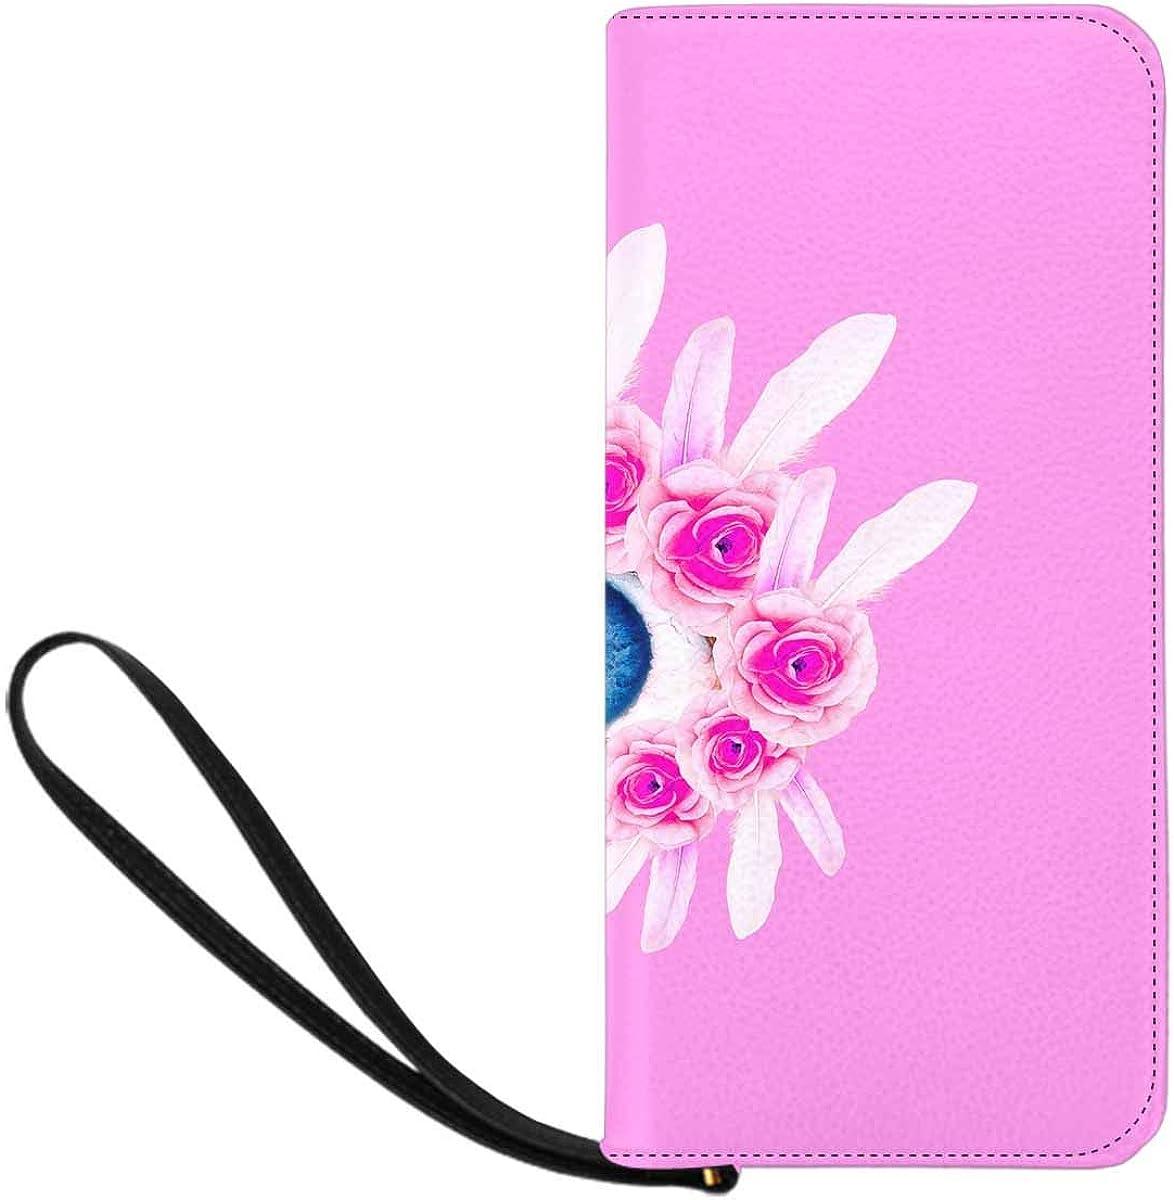 INTERESTPRINT Pink Florals Eye Wristlet Clutch Large Travel Purse Wristlet